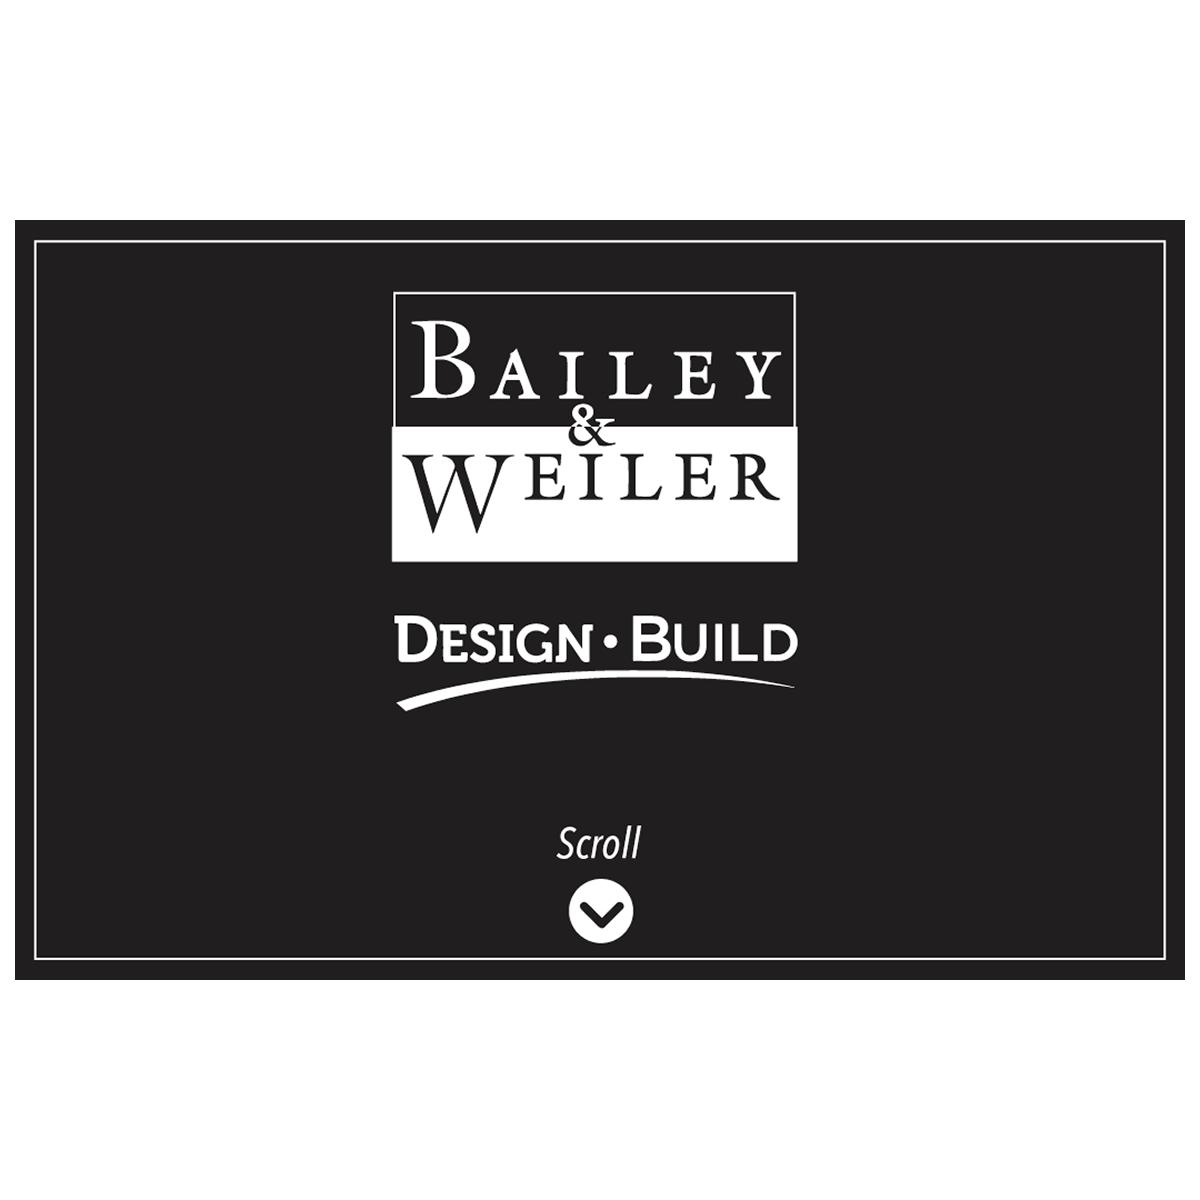 BaileyWeilerLogos_F copy